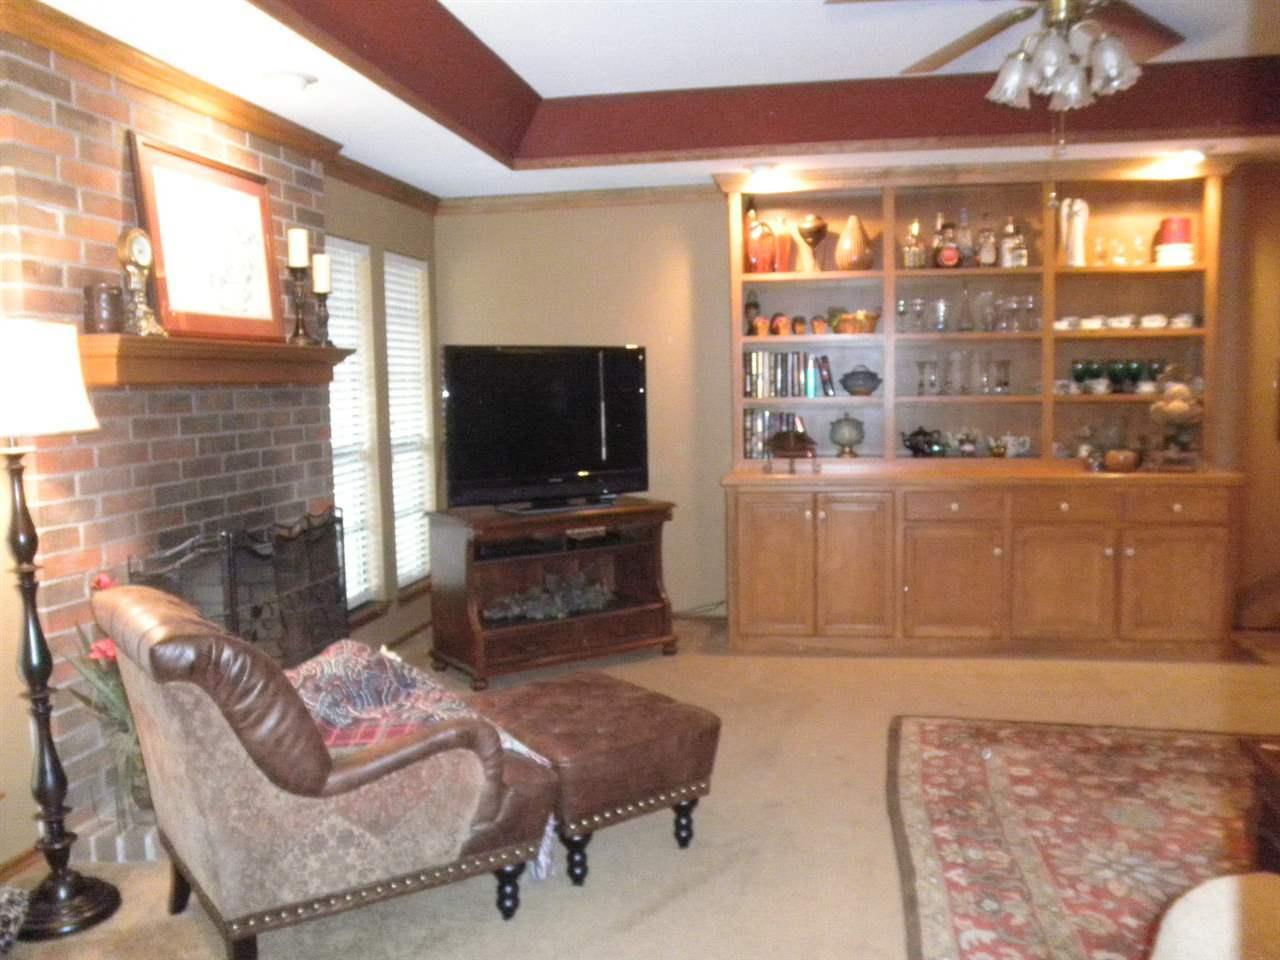 Sold Intraoffice W/MLS | 2800 Green Meadow Ponca City, OK 74604 4